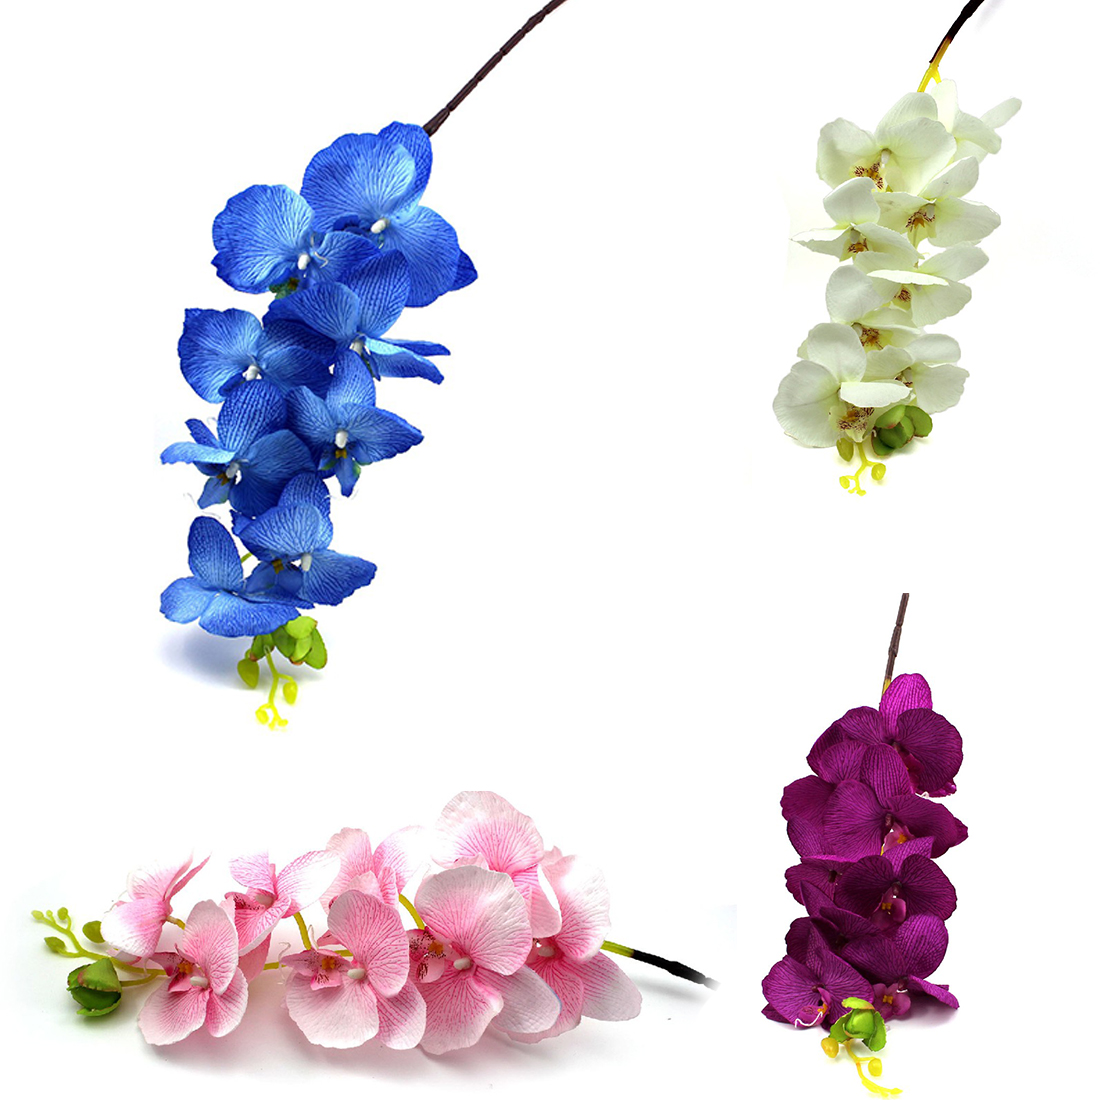 Popular Silk Flower Arrangements Wholesale Buy Cheap Silk Flower Arrangements